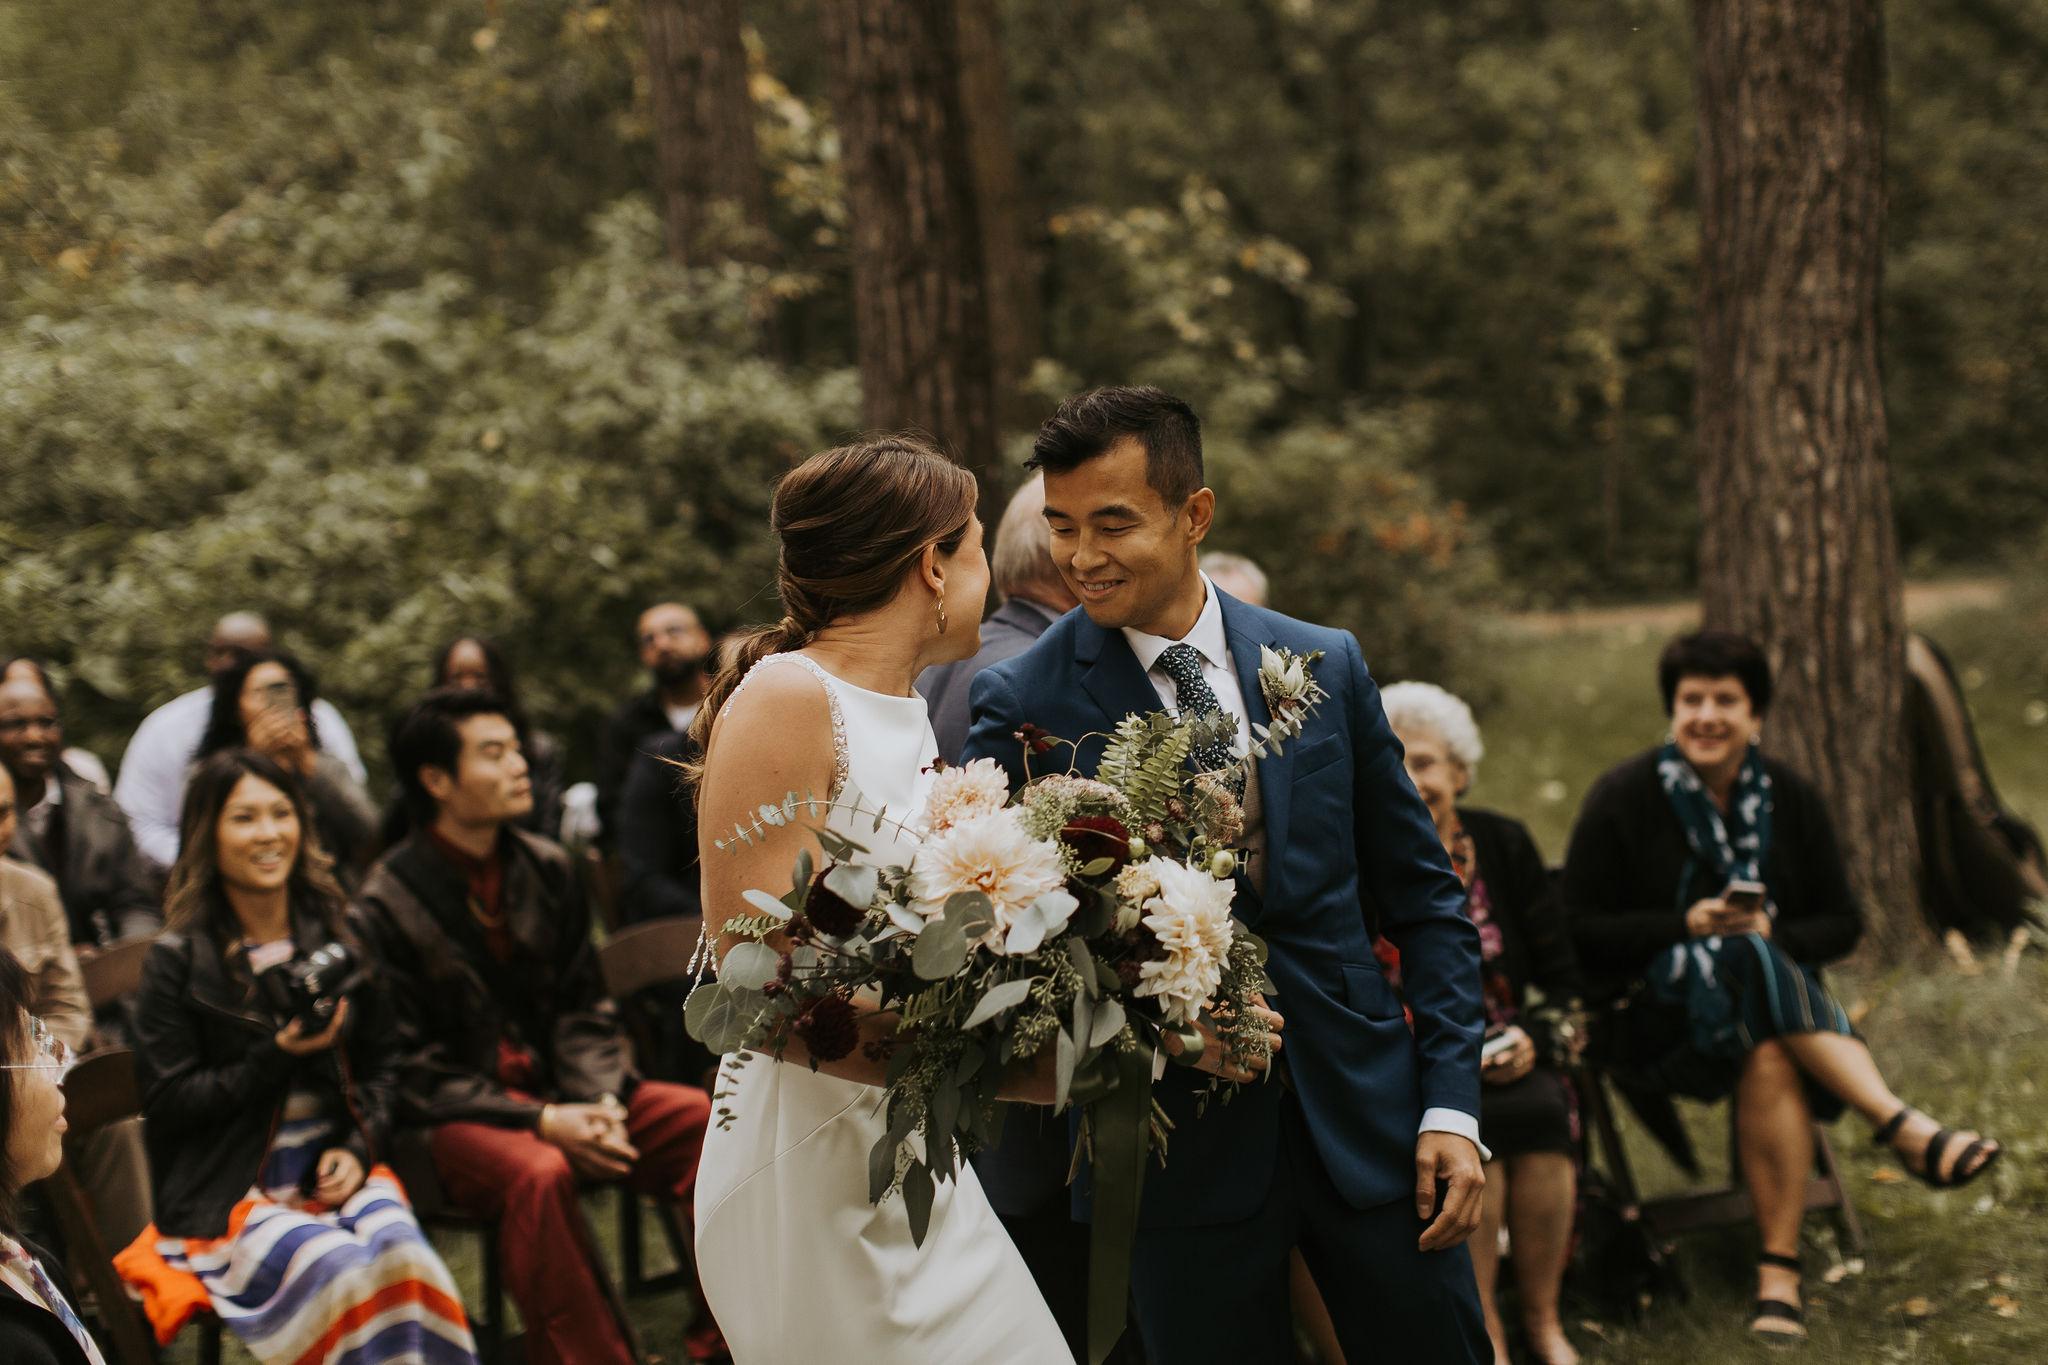 AK_Wedding_Ceremony-47.jpg